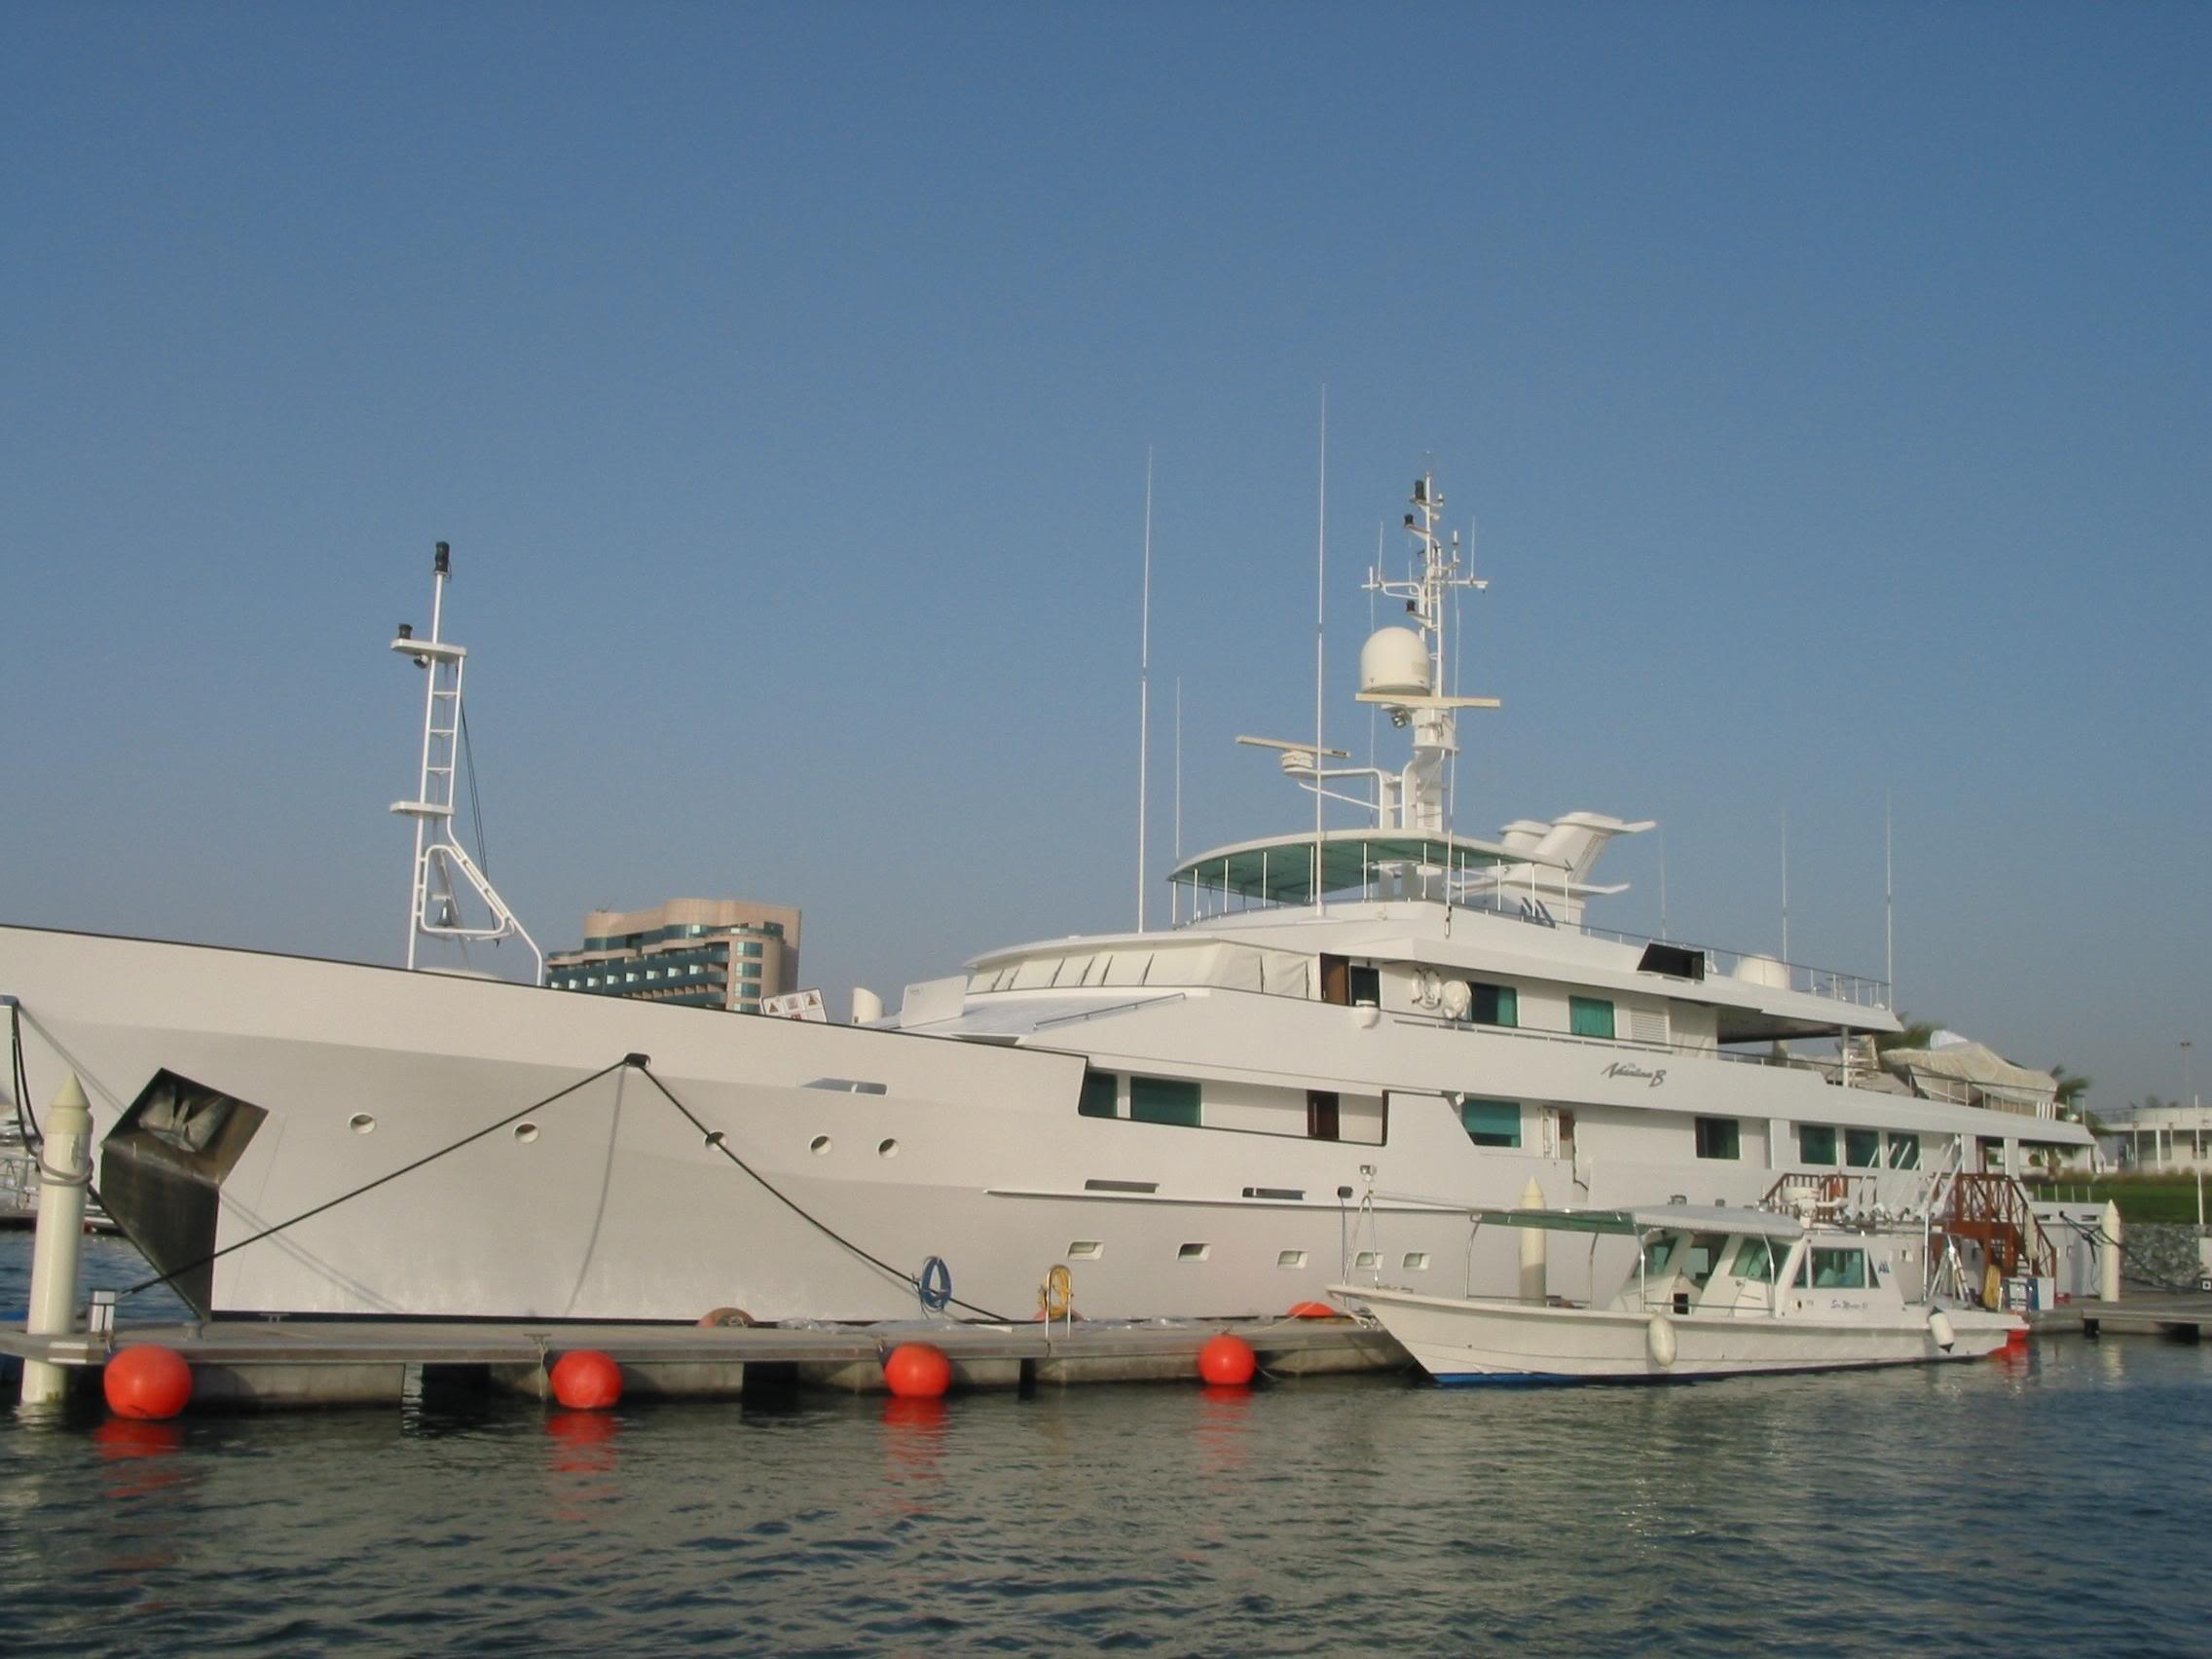 The 56m Yacht O'NATALINA